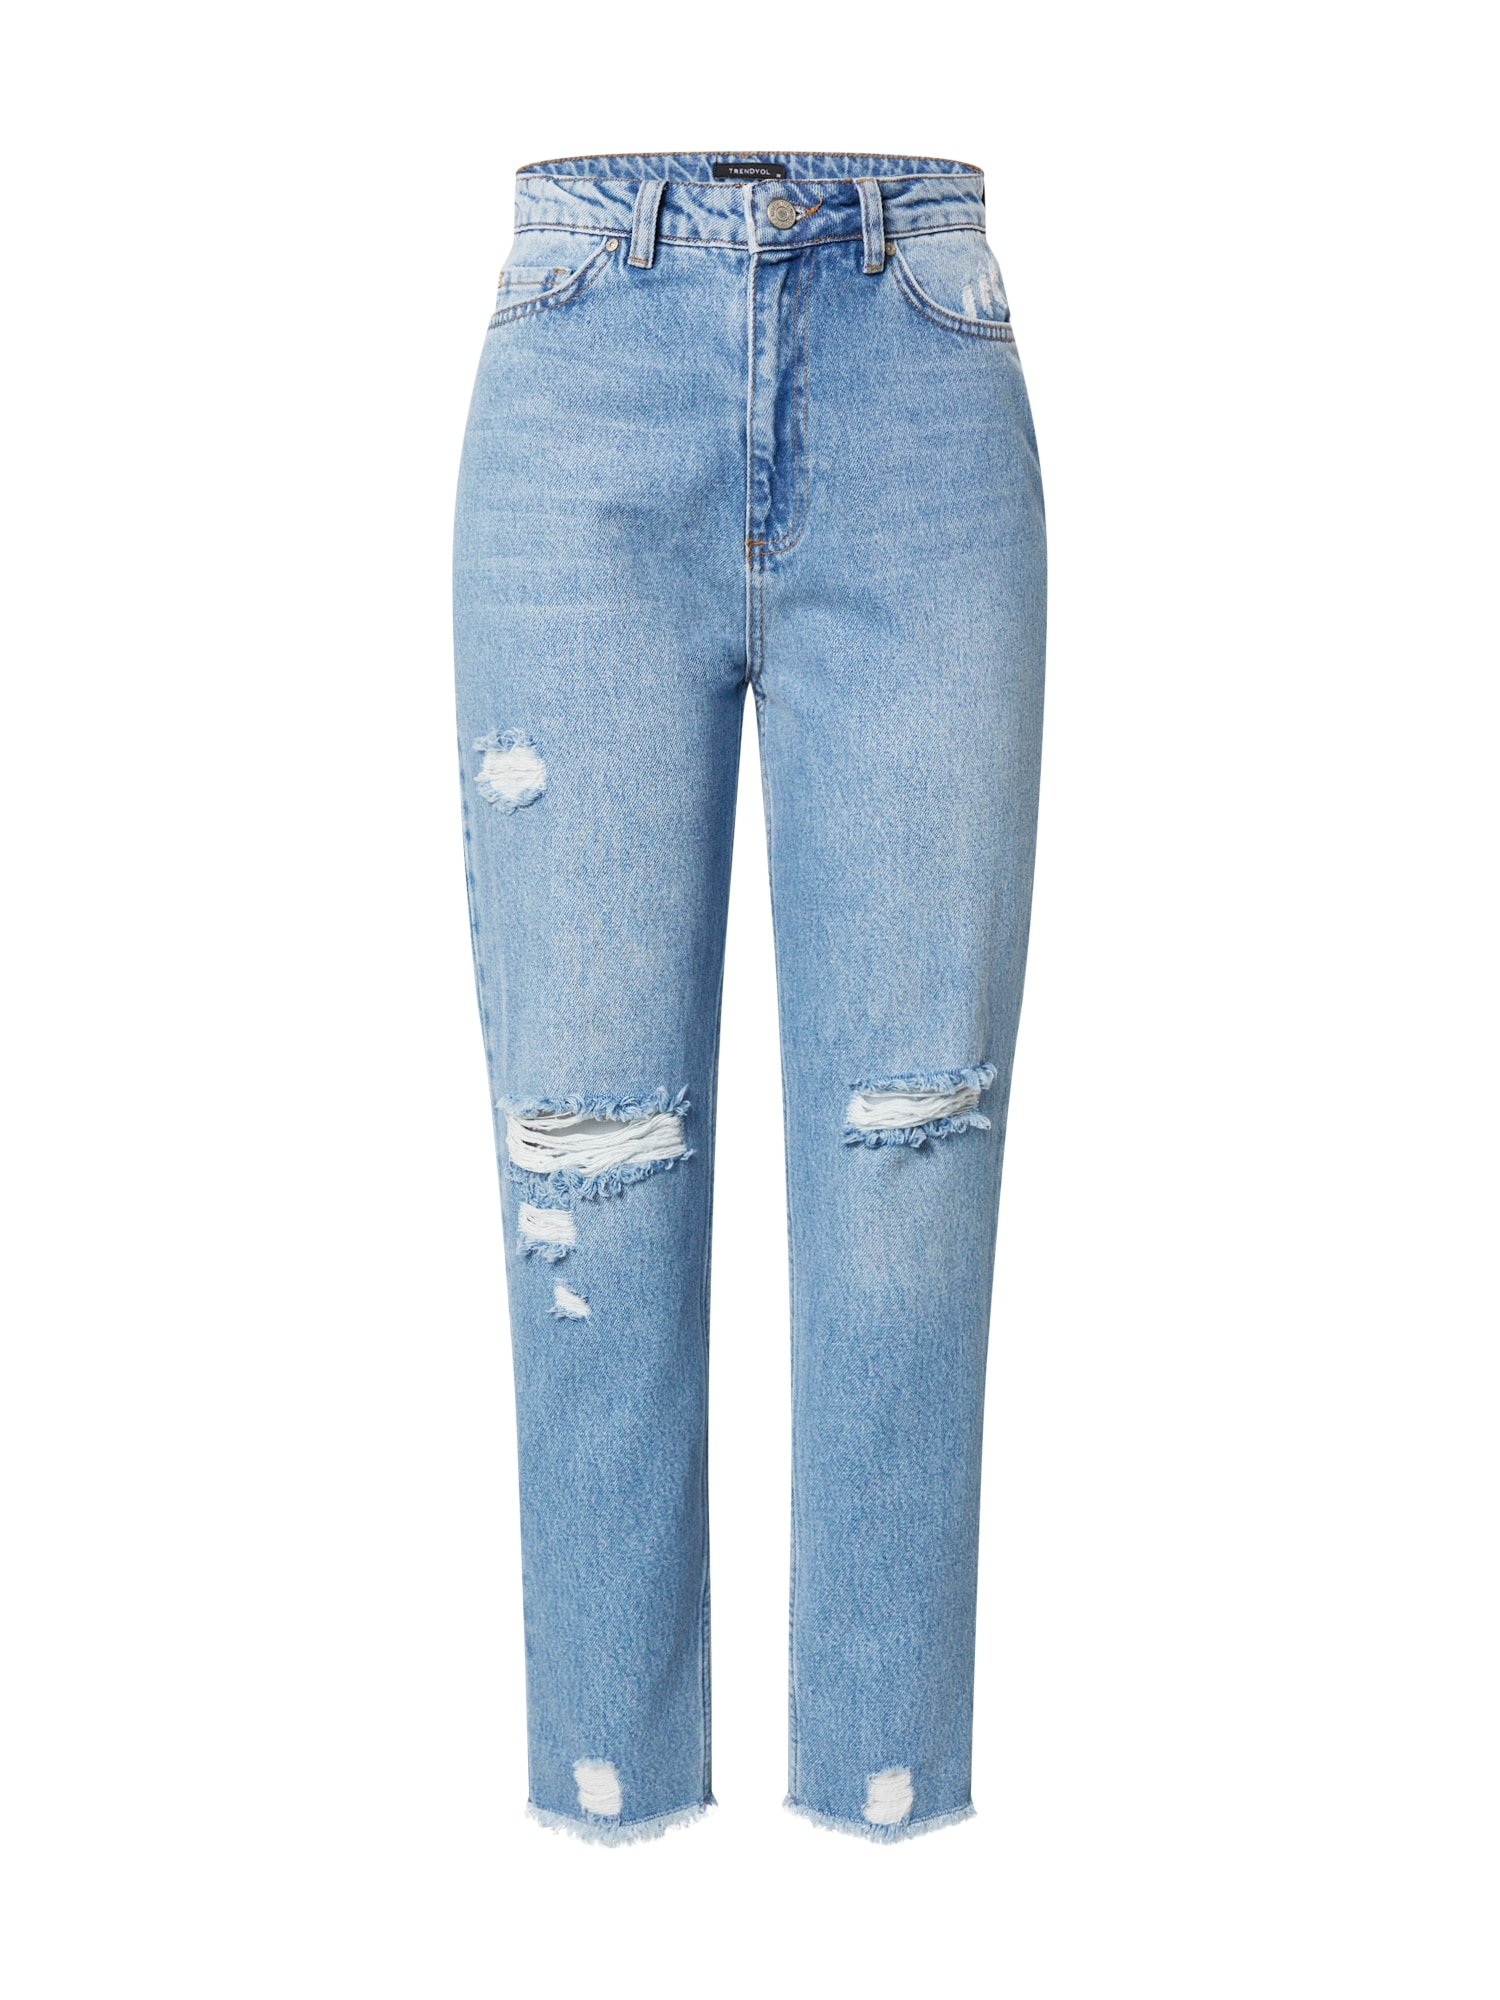 Trendyol Džinsai tamsiai (džinso) mėlyna